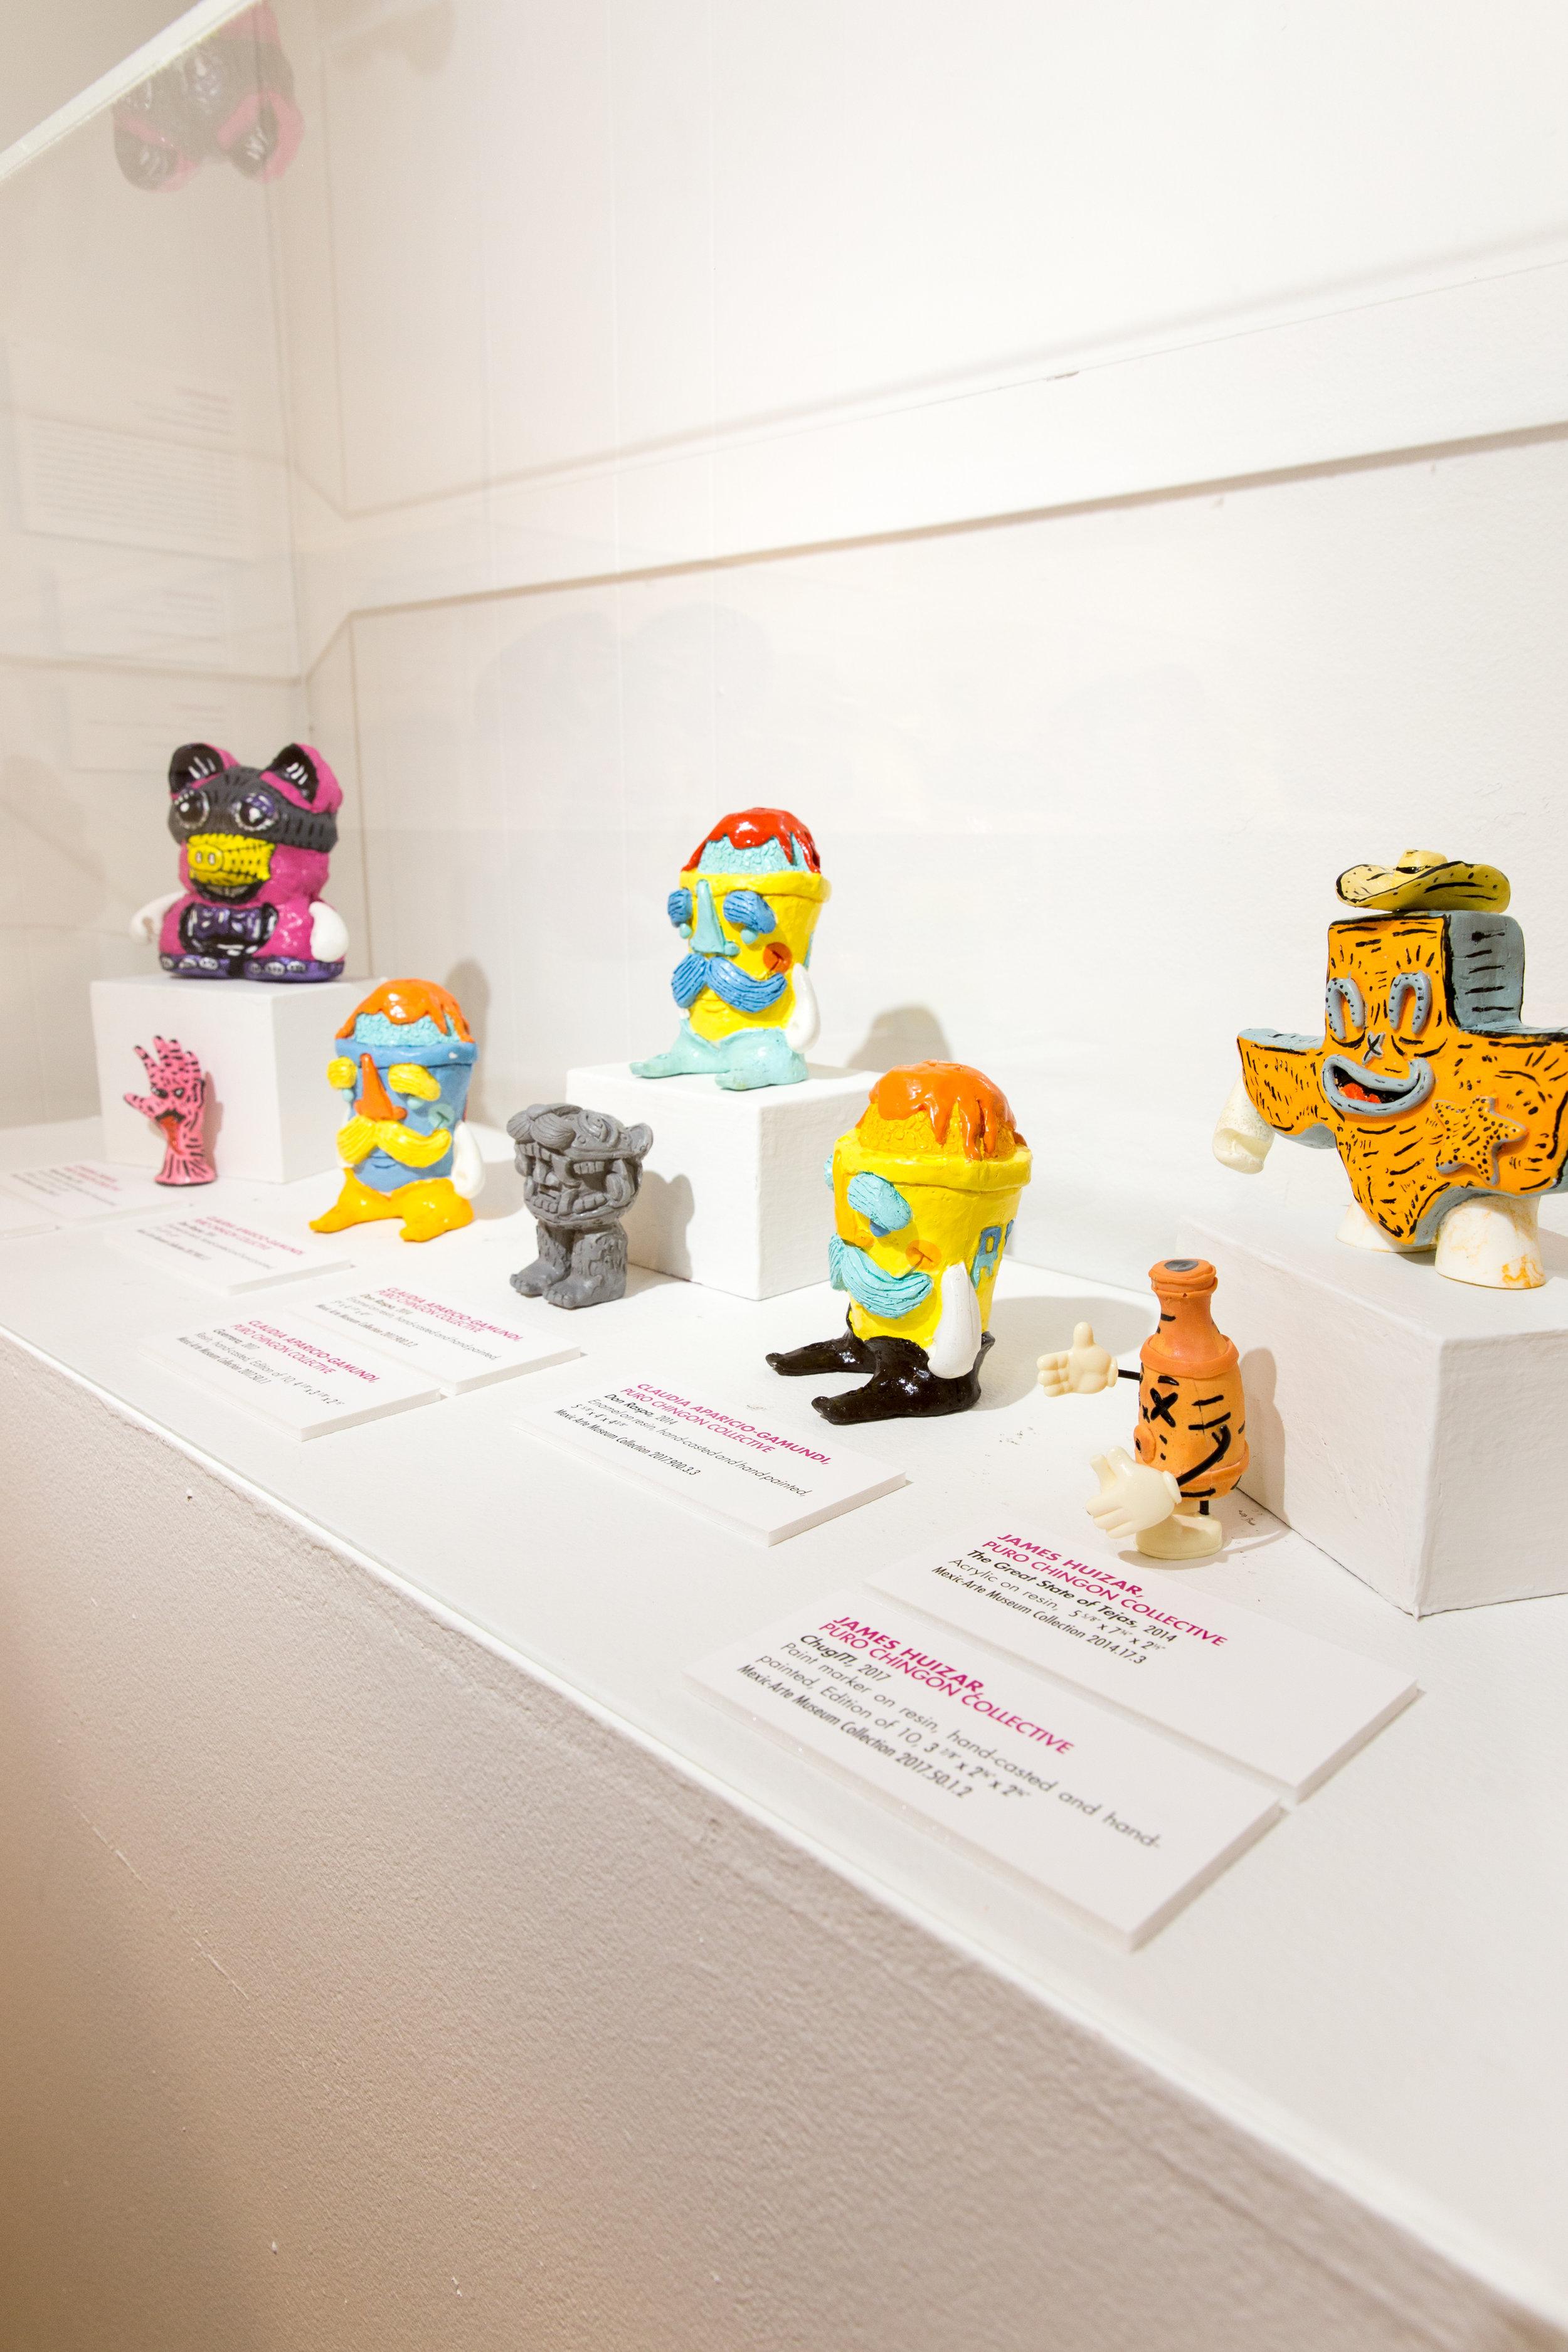 Expresiones en Esculturas , Mexic-Arte Museum June 21-August 25, 2019, Austin, TX, (Curated by Rebecca Gomez)